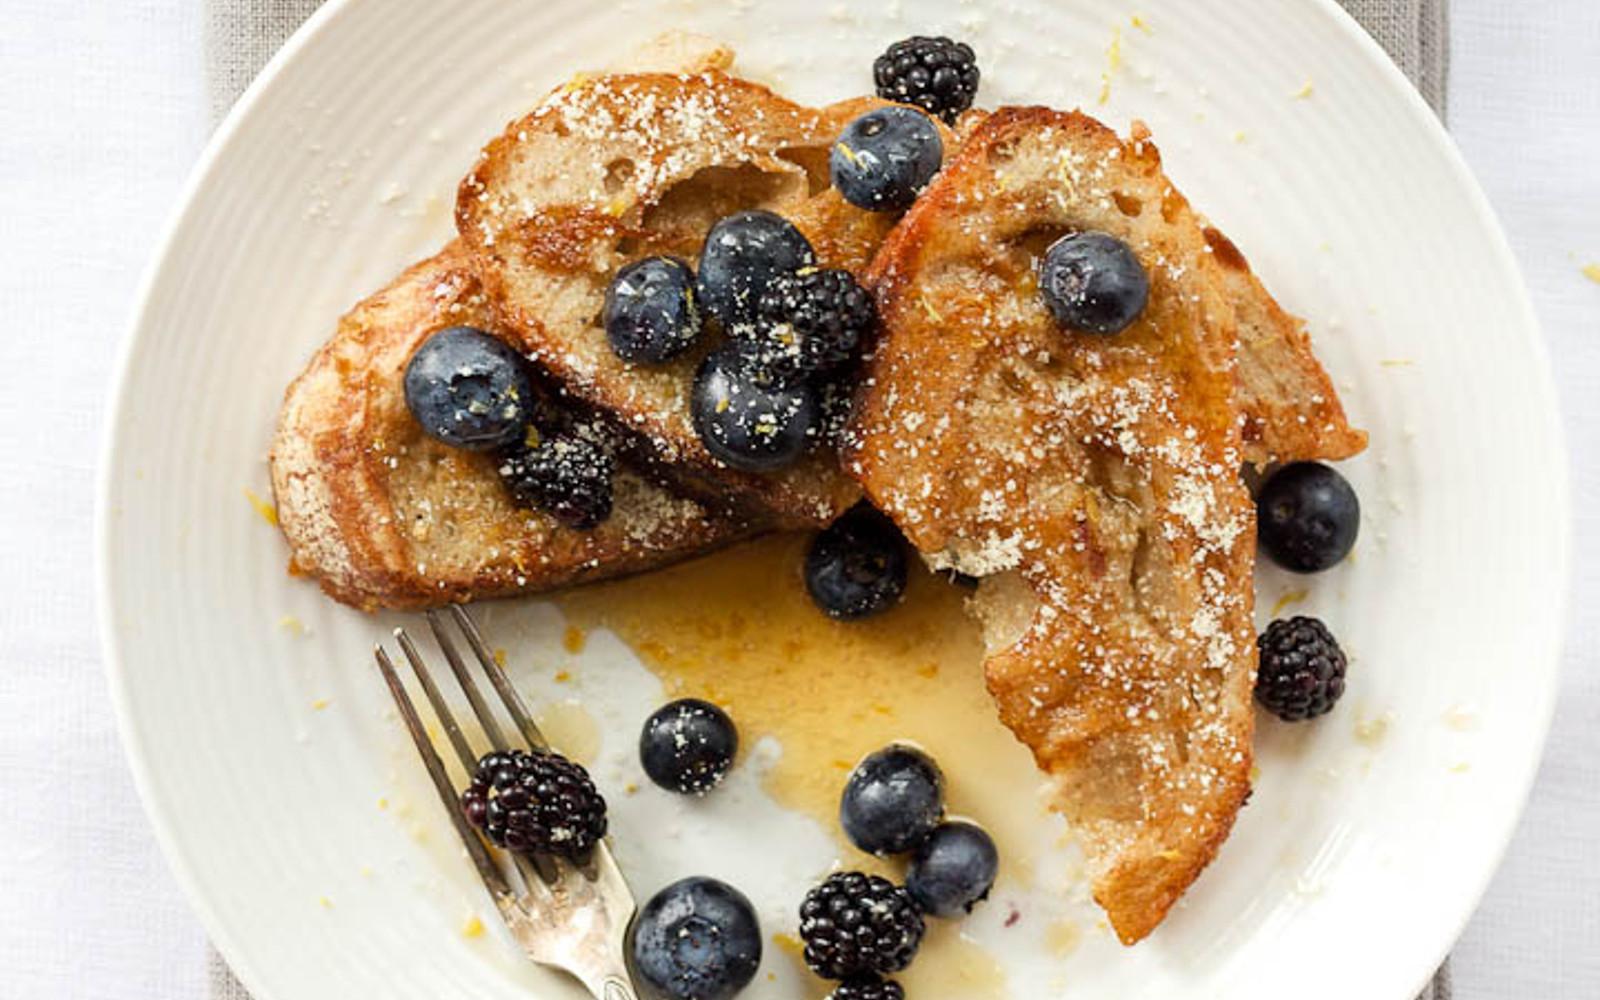 Almond Cardamom and Vanilla French Toast 3